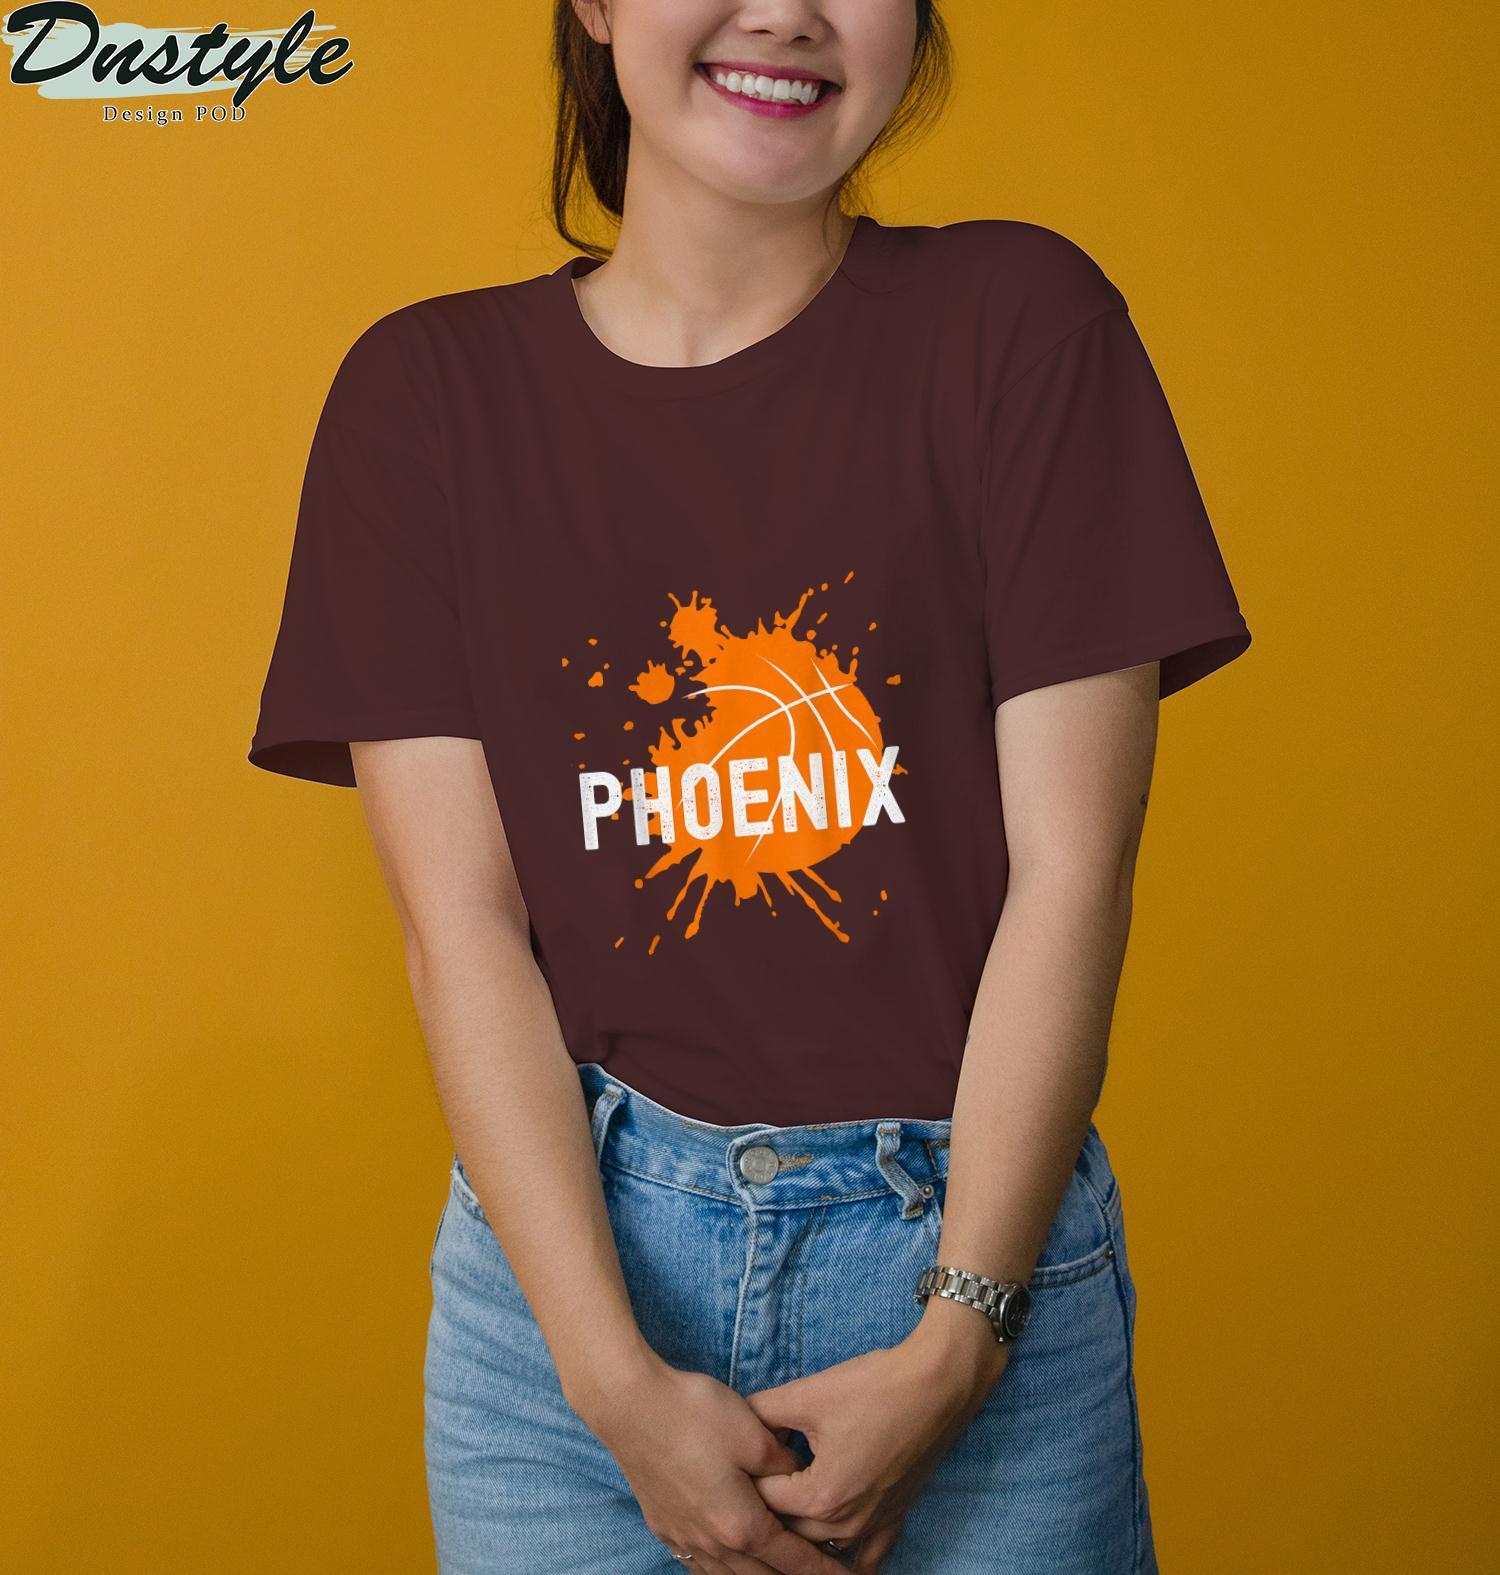 Phoenix Basketball B-Ball Valley PHX City Arizona State T-Shirt 3